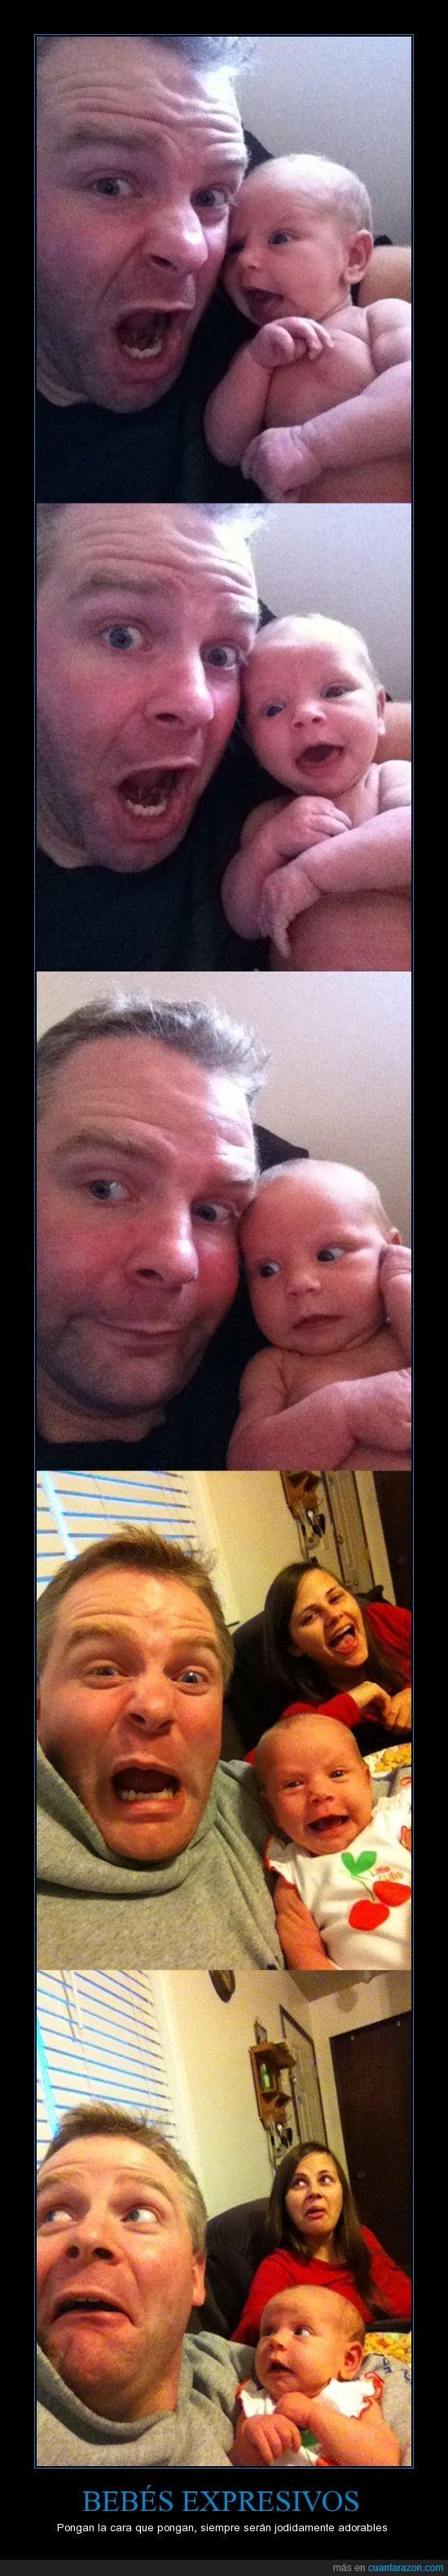 adorable,bebe,cara,expresivo,gesto,jodidamente,mama,papa